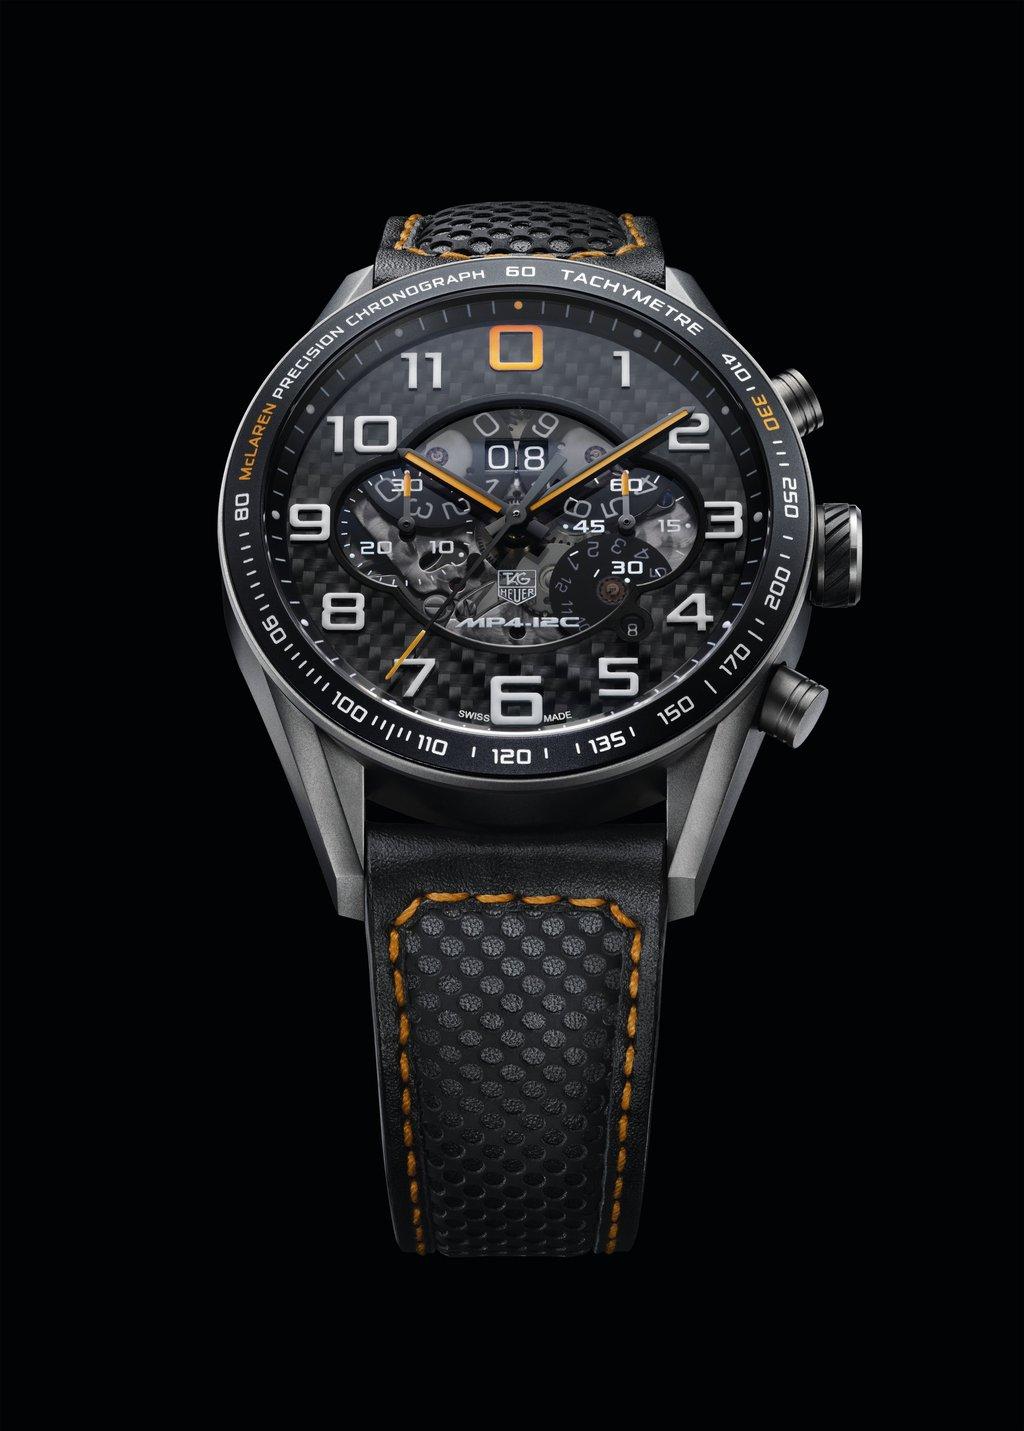 5b6bcdd64ed 10. Tag Heuer Carrera MP4-12C Watch (14 mil dólares)